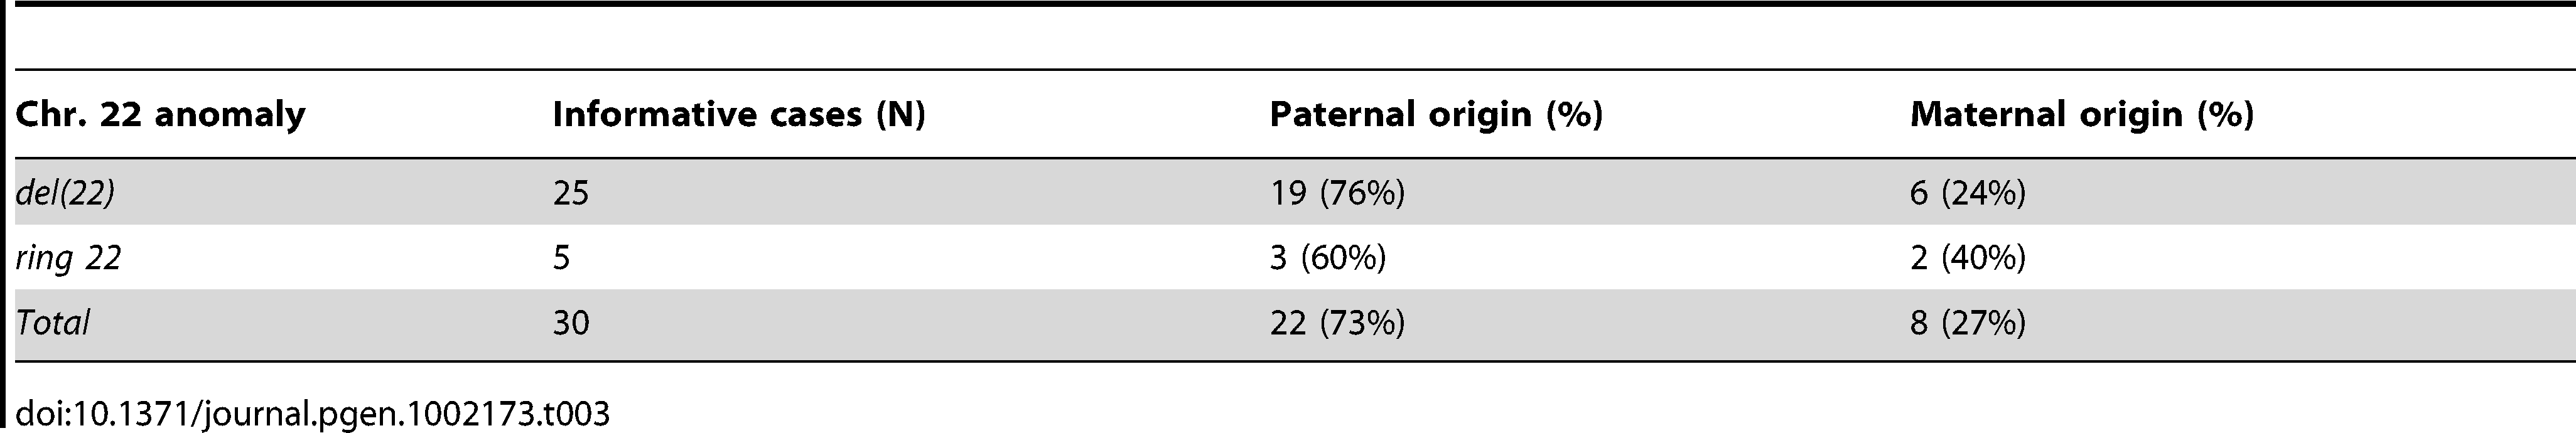 Parental origin of the <i>de novo</i> 22q13 deletions.